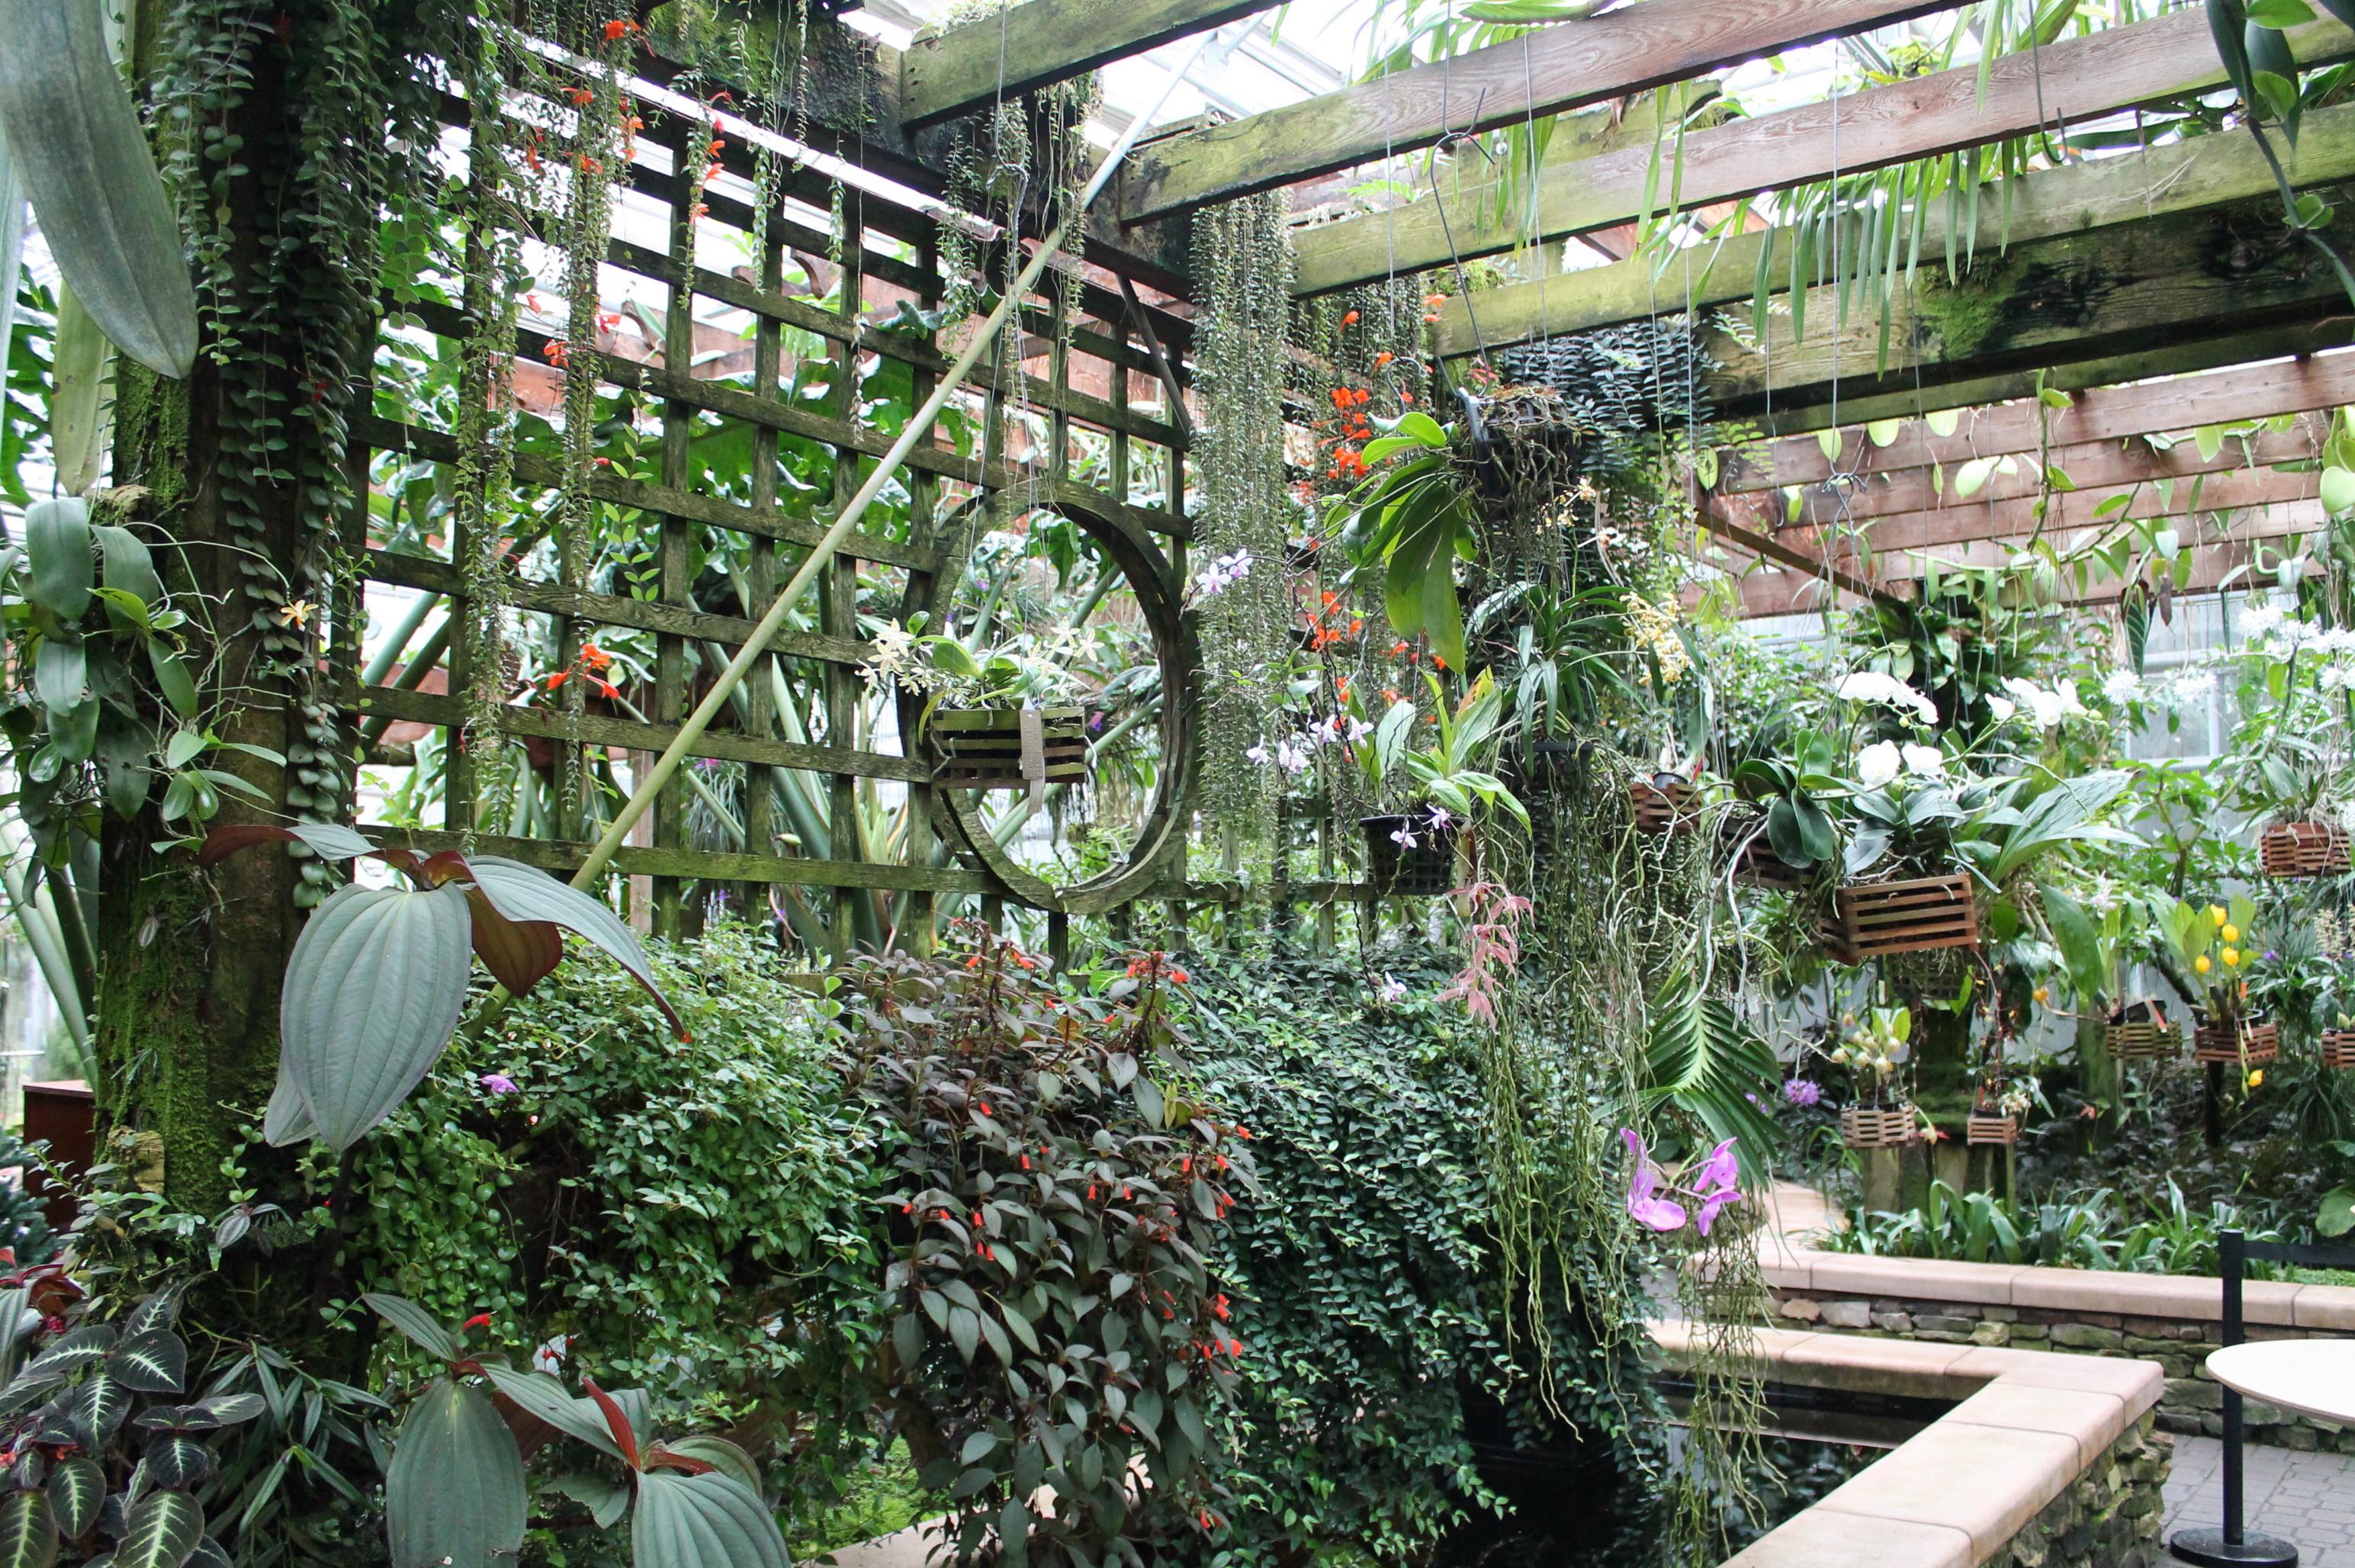 Captivating Fuqua Orchid Center Within Atlanta Botanical Garden.